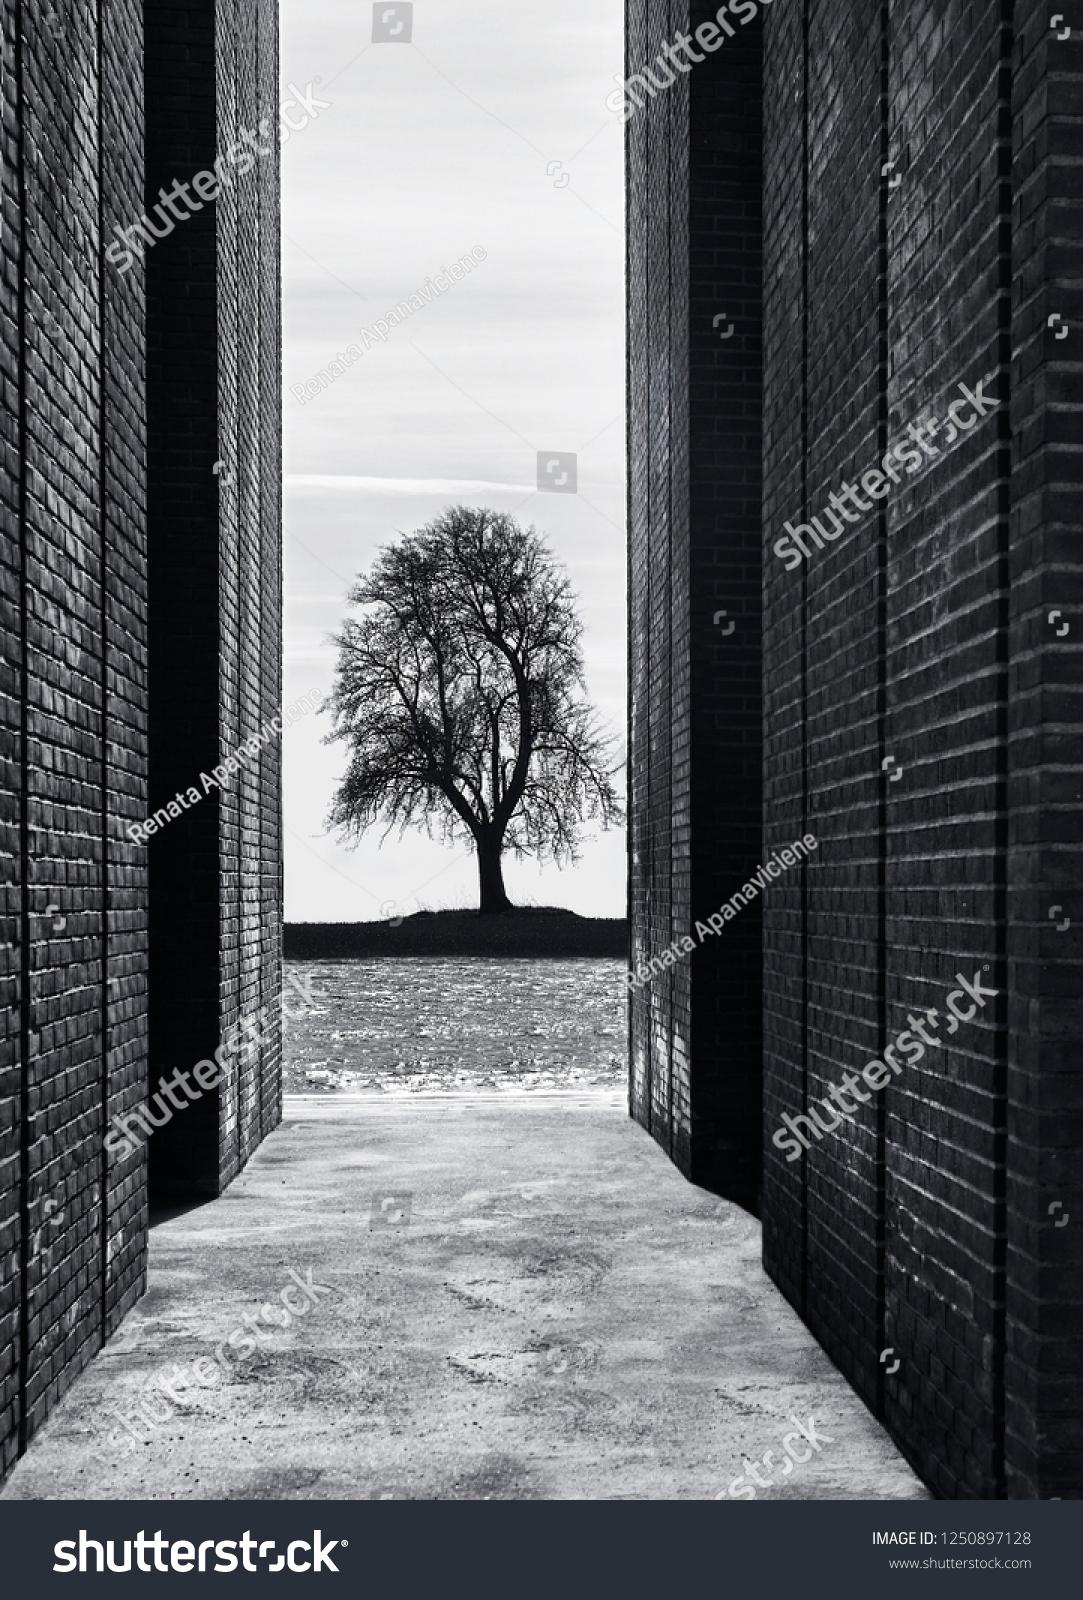 Artistic Creative Photo Black White Tree Stock Photo Edit Now 1250897128